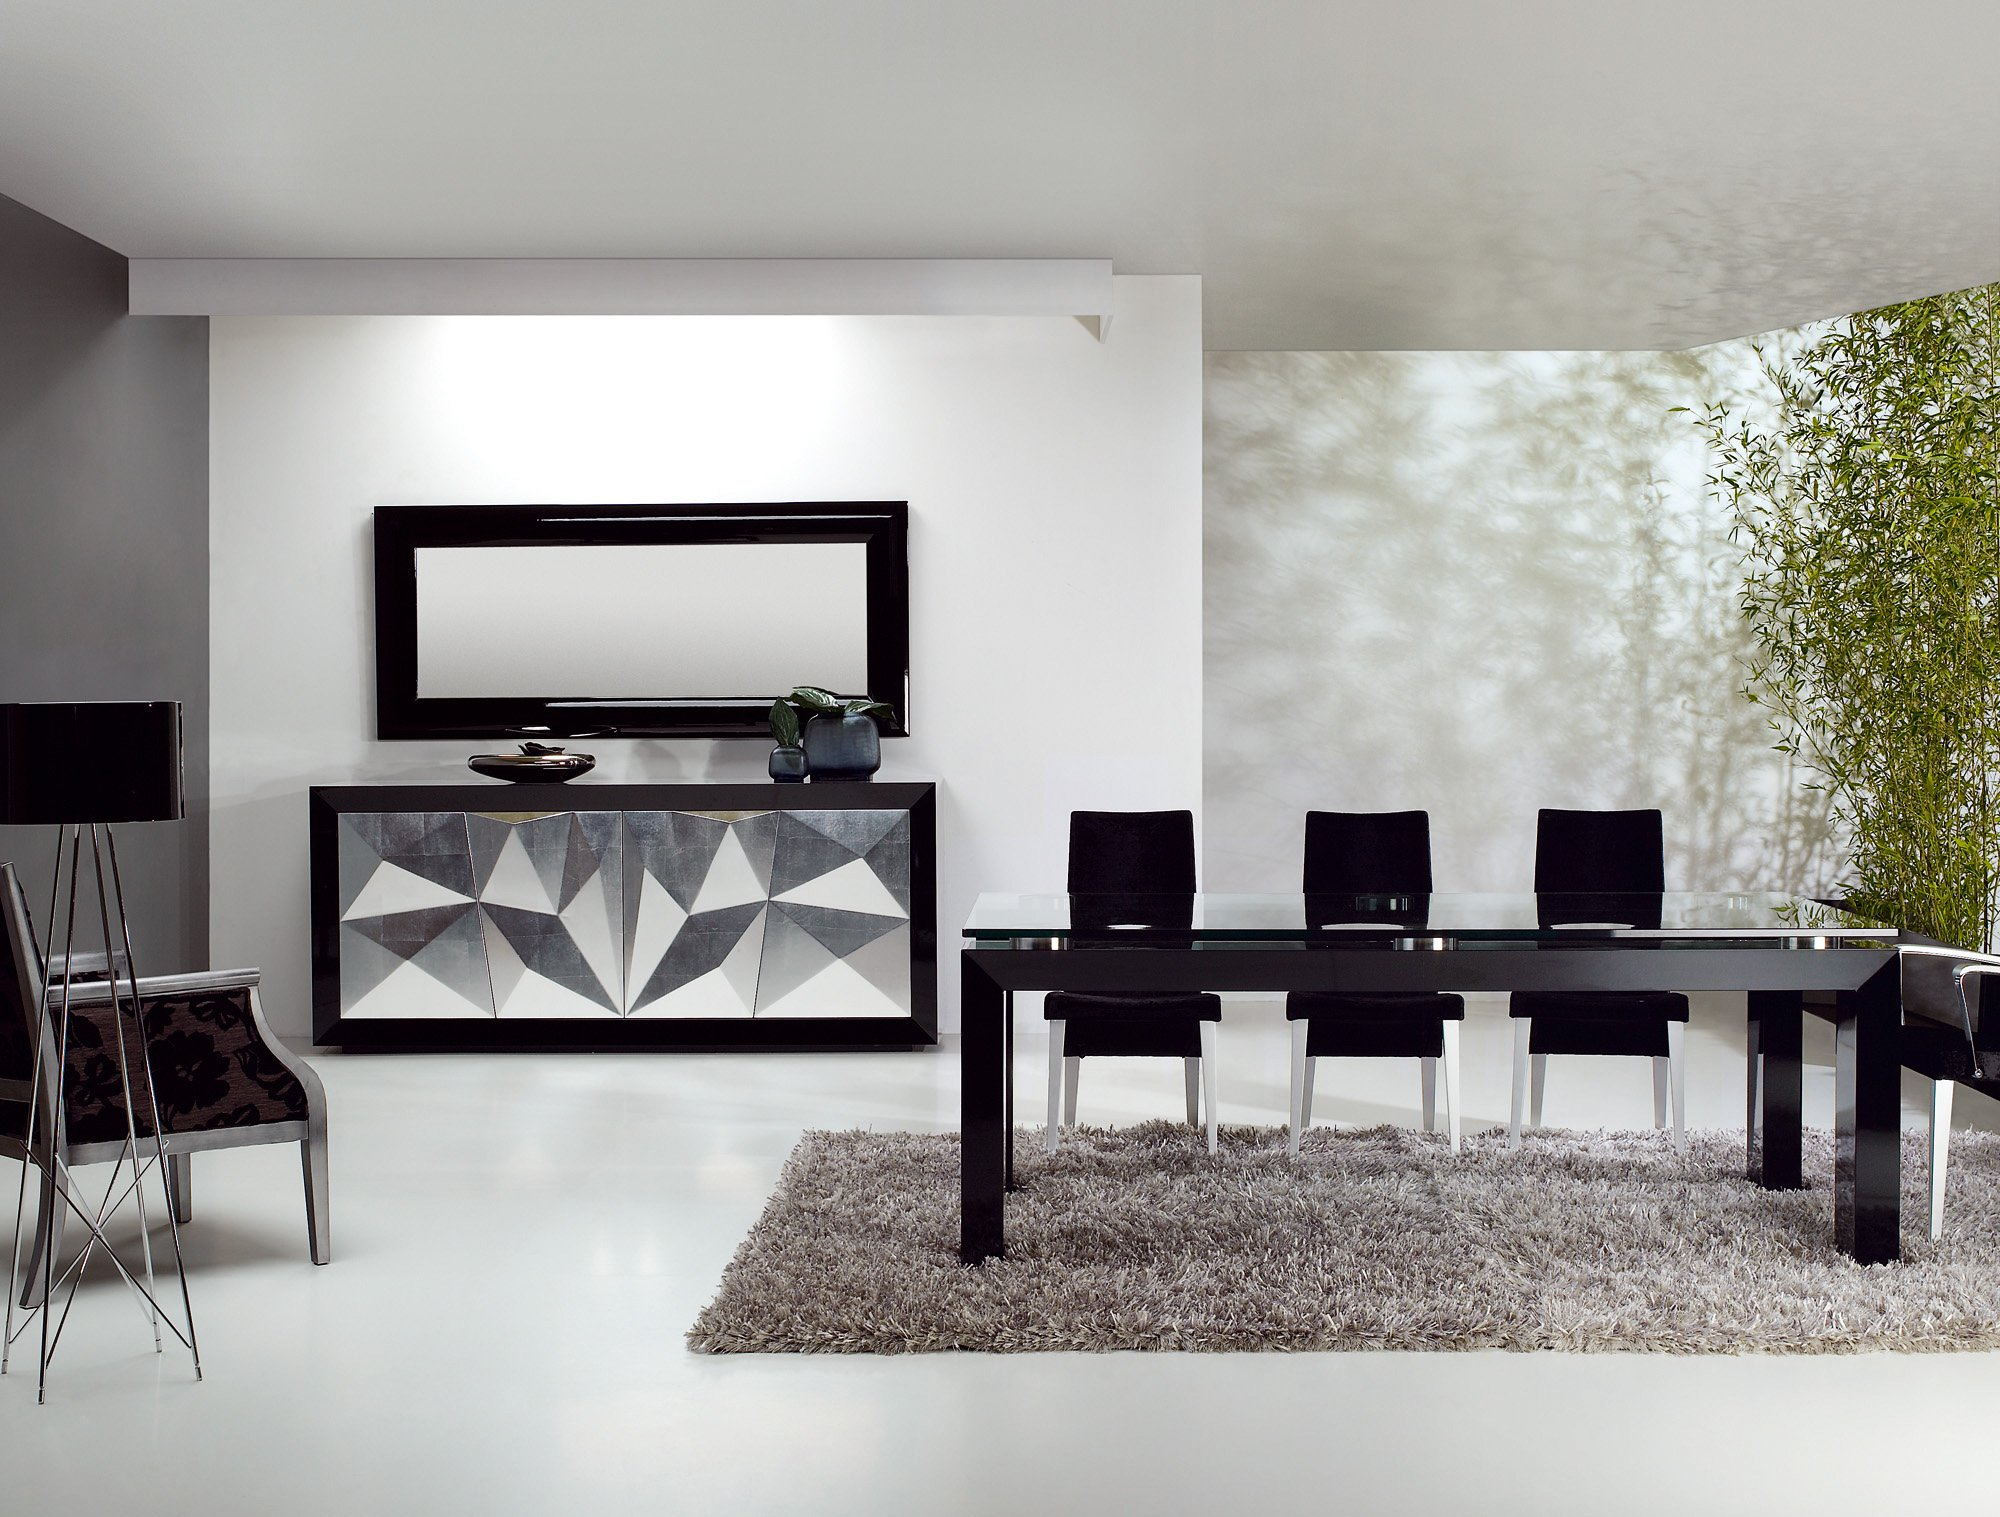 Salon comedor de diseo affordable decoracion salon for Comedor grande moderno